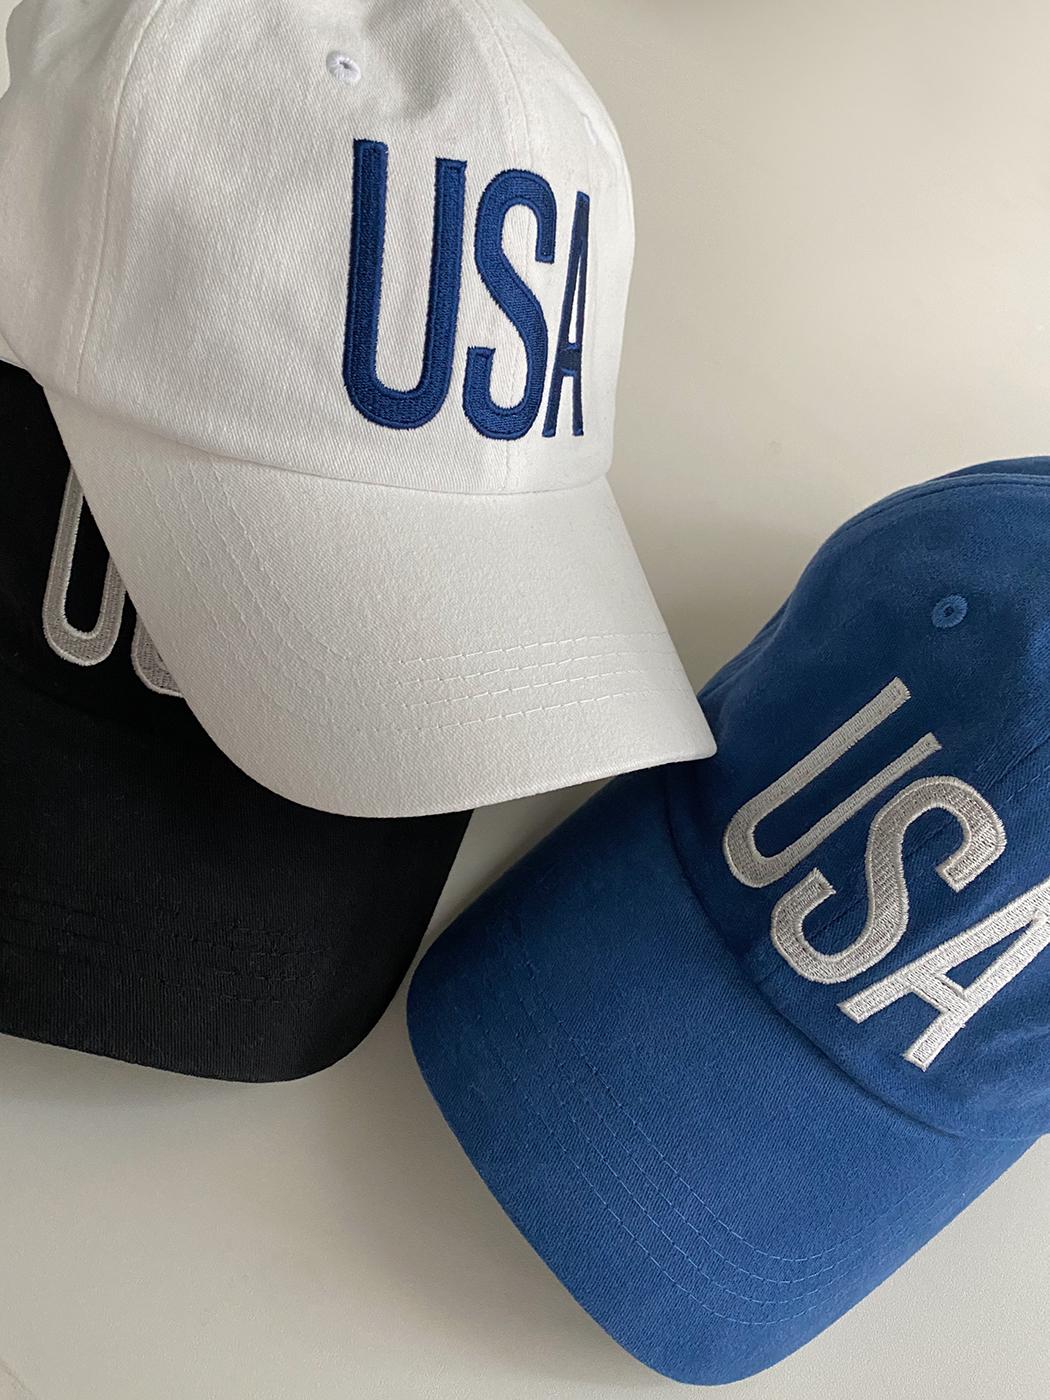 'USA' embroidered ball cap